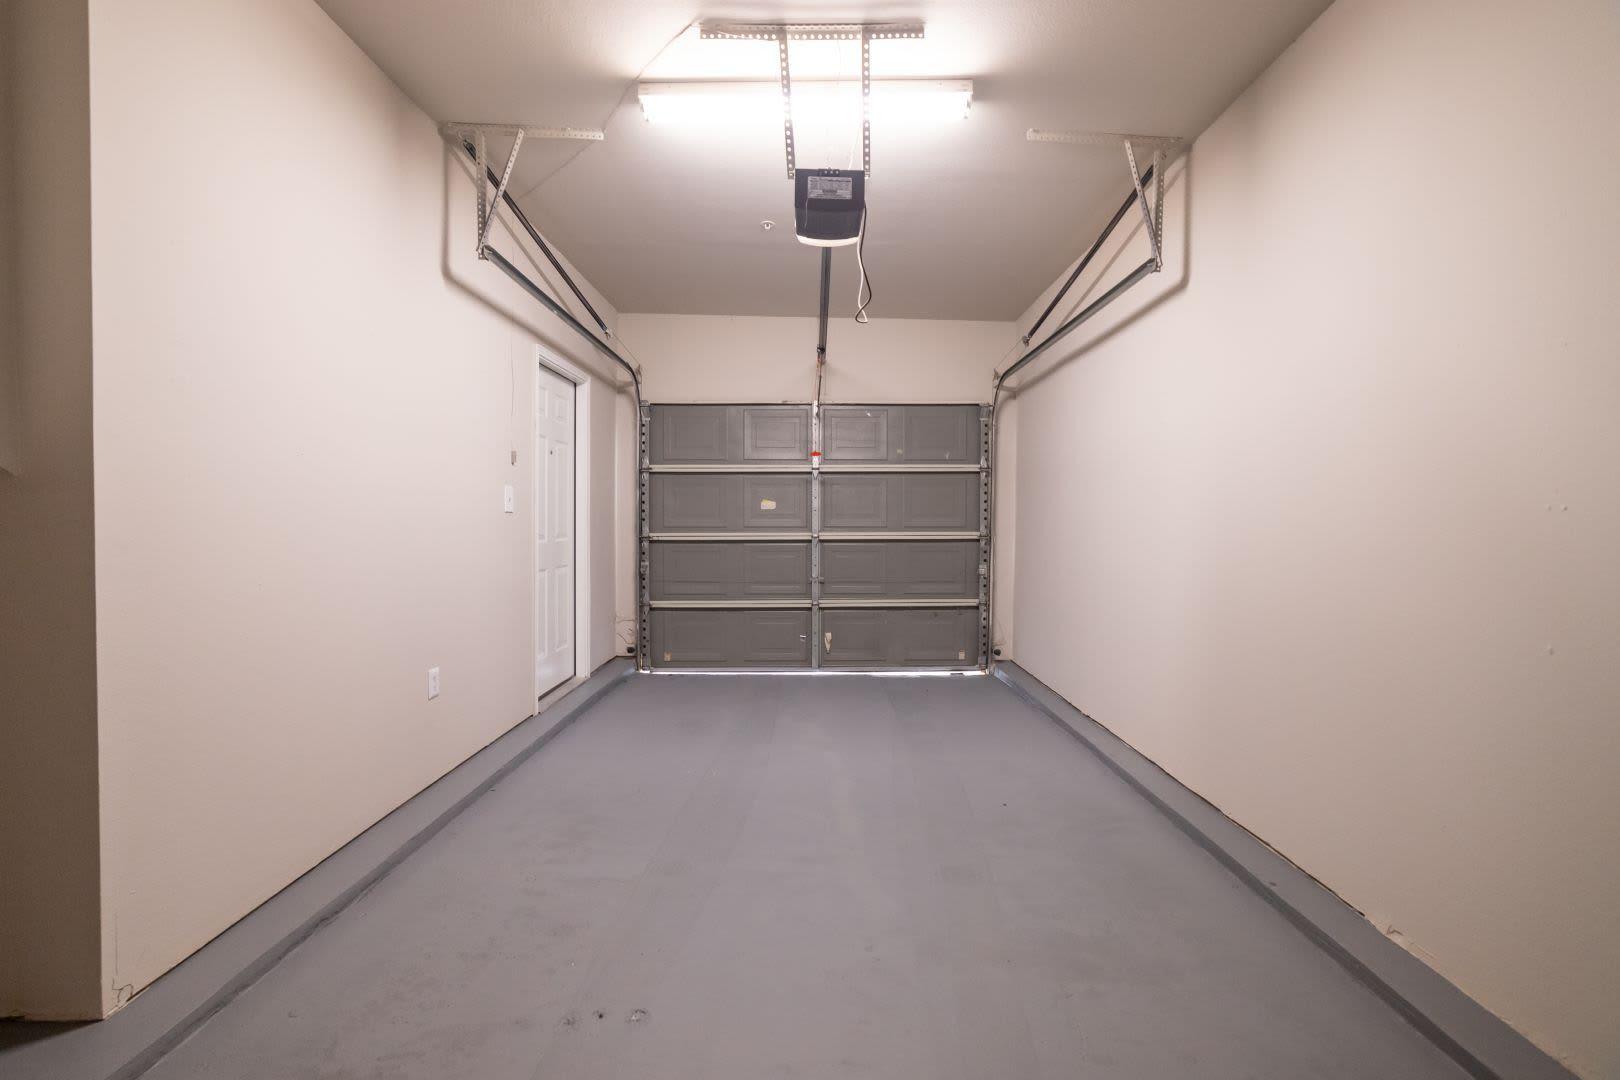 Garage interior at Marquis at Stonebriar in Frisco, Texas